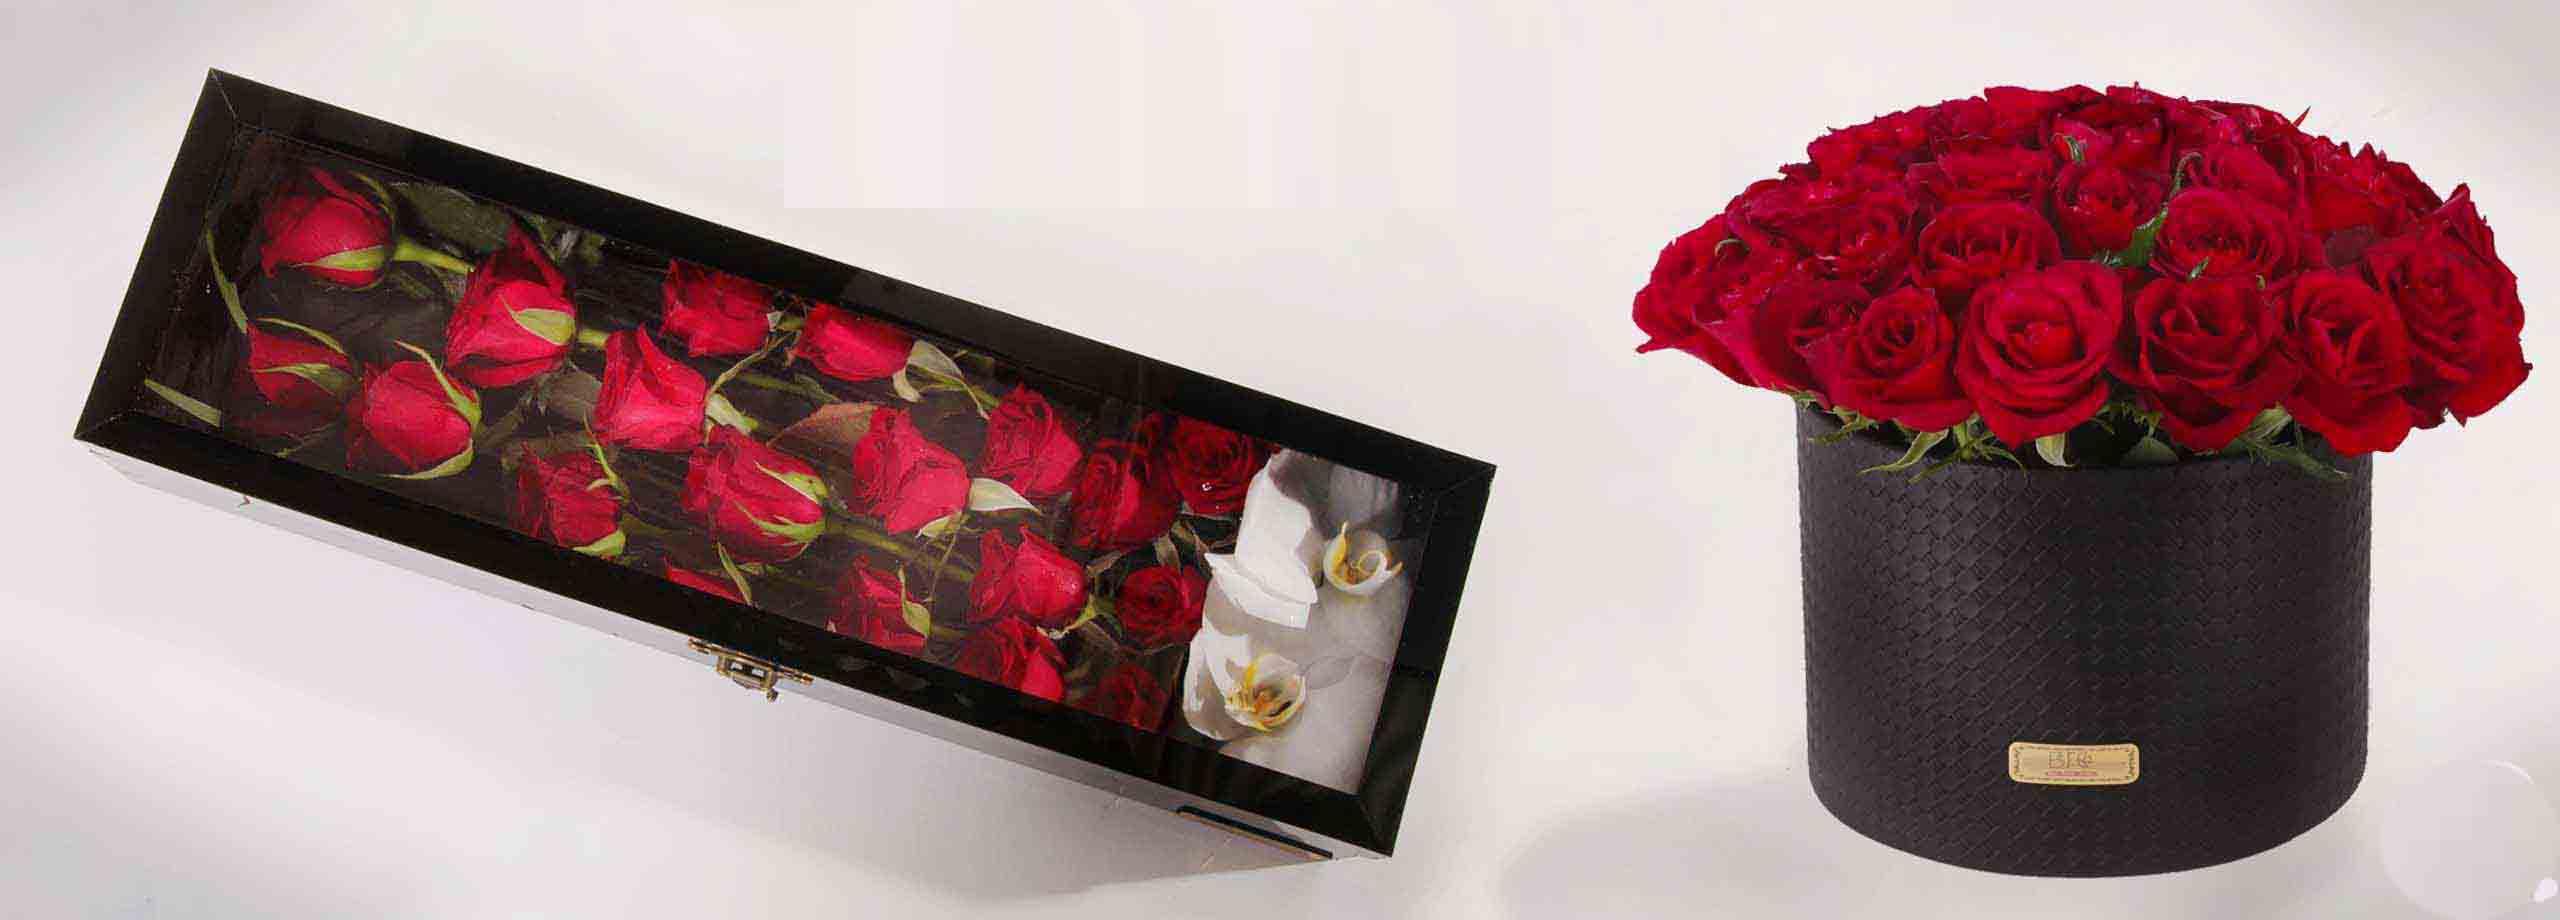 جعبه گل تسلیت | استند تسلیت | تاج گل تسلیت